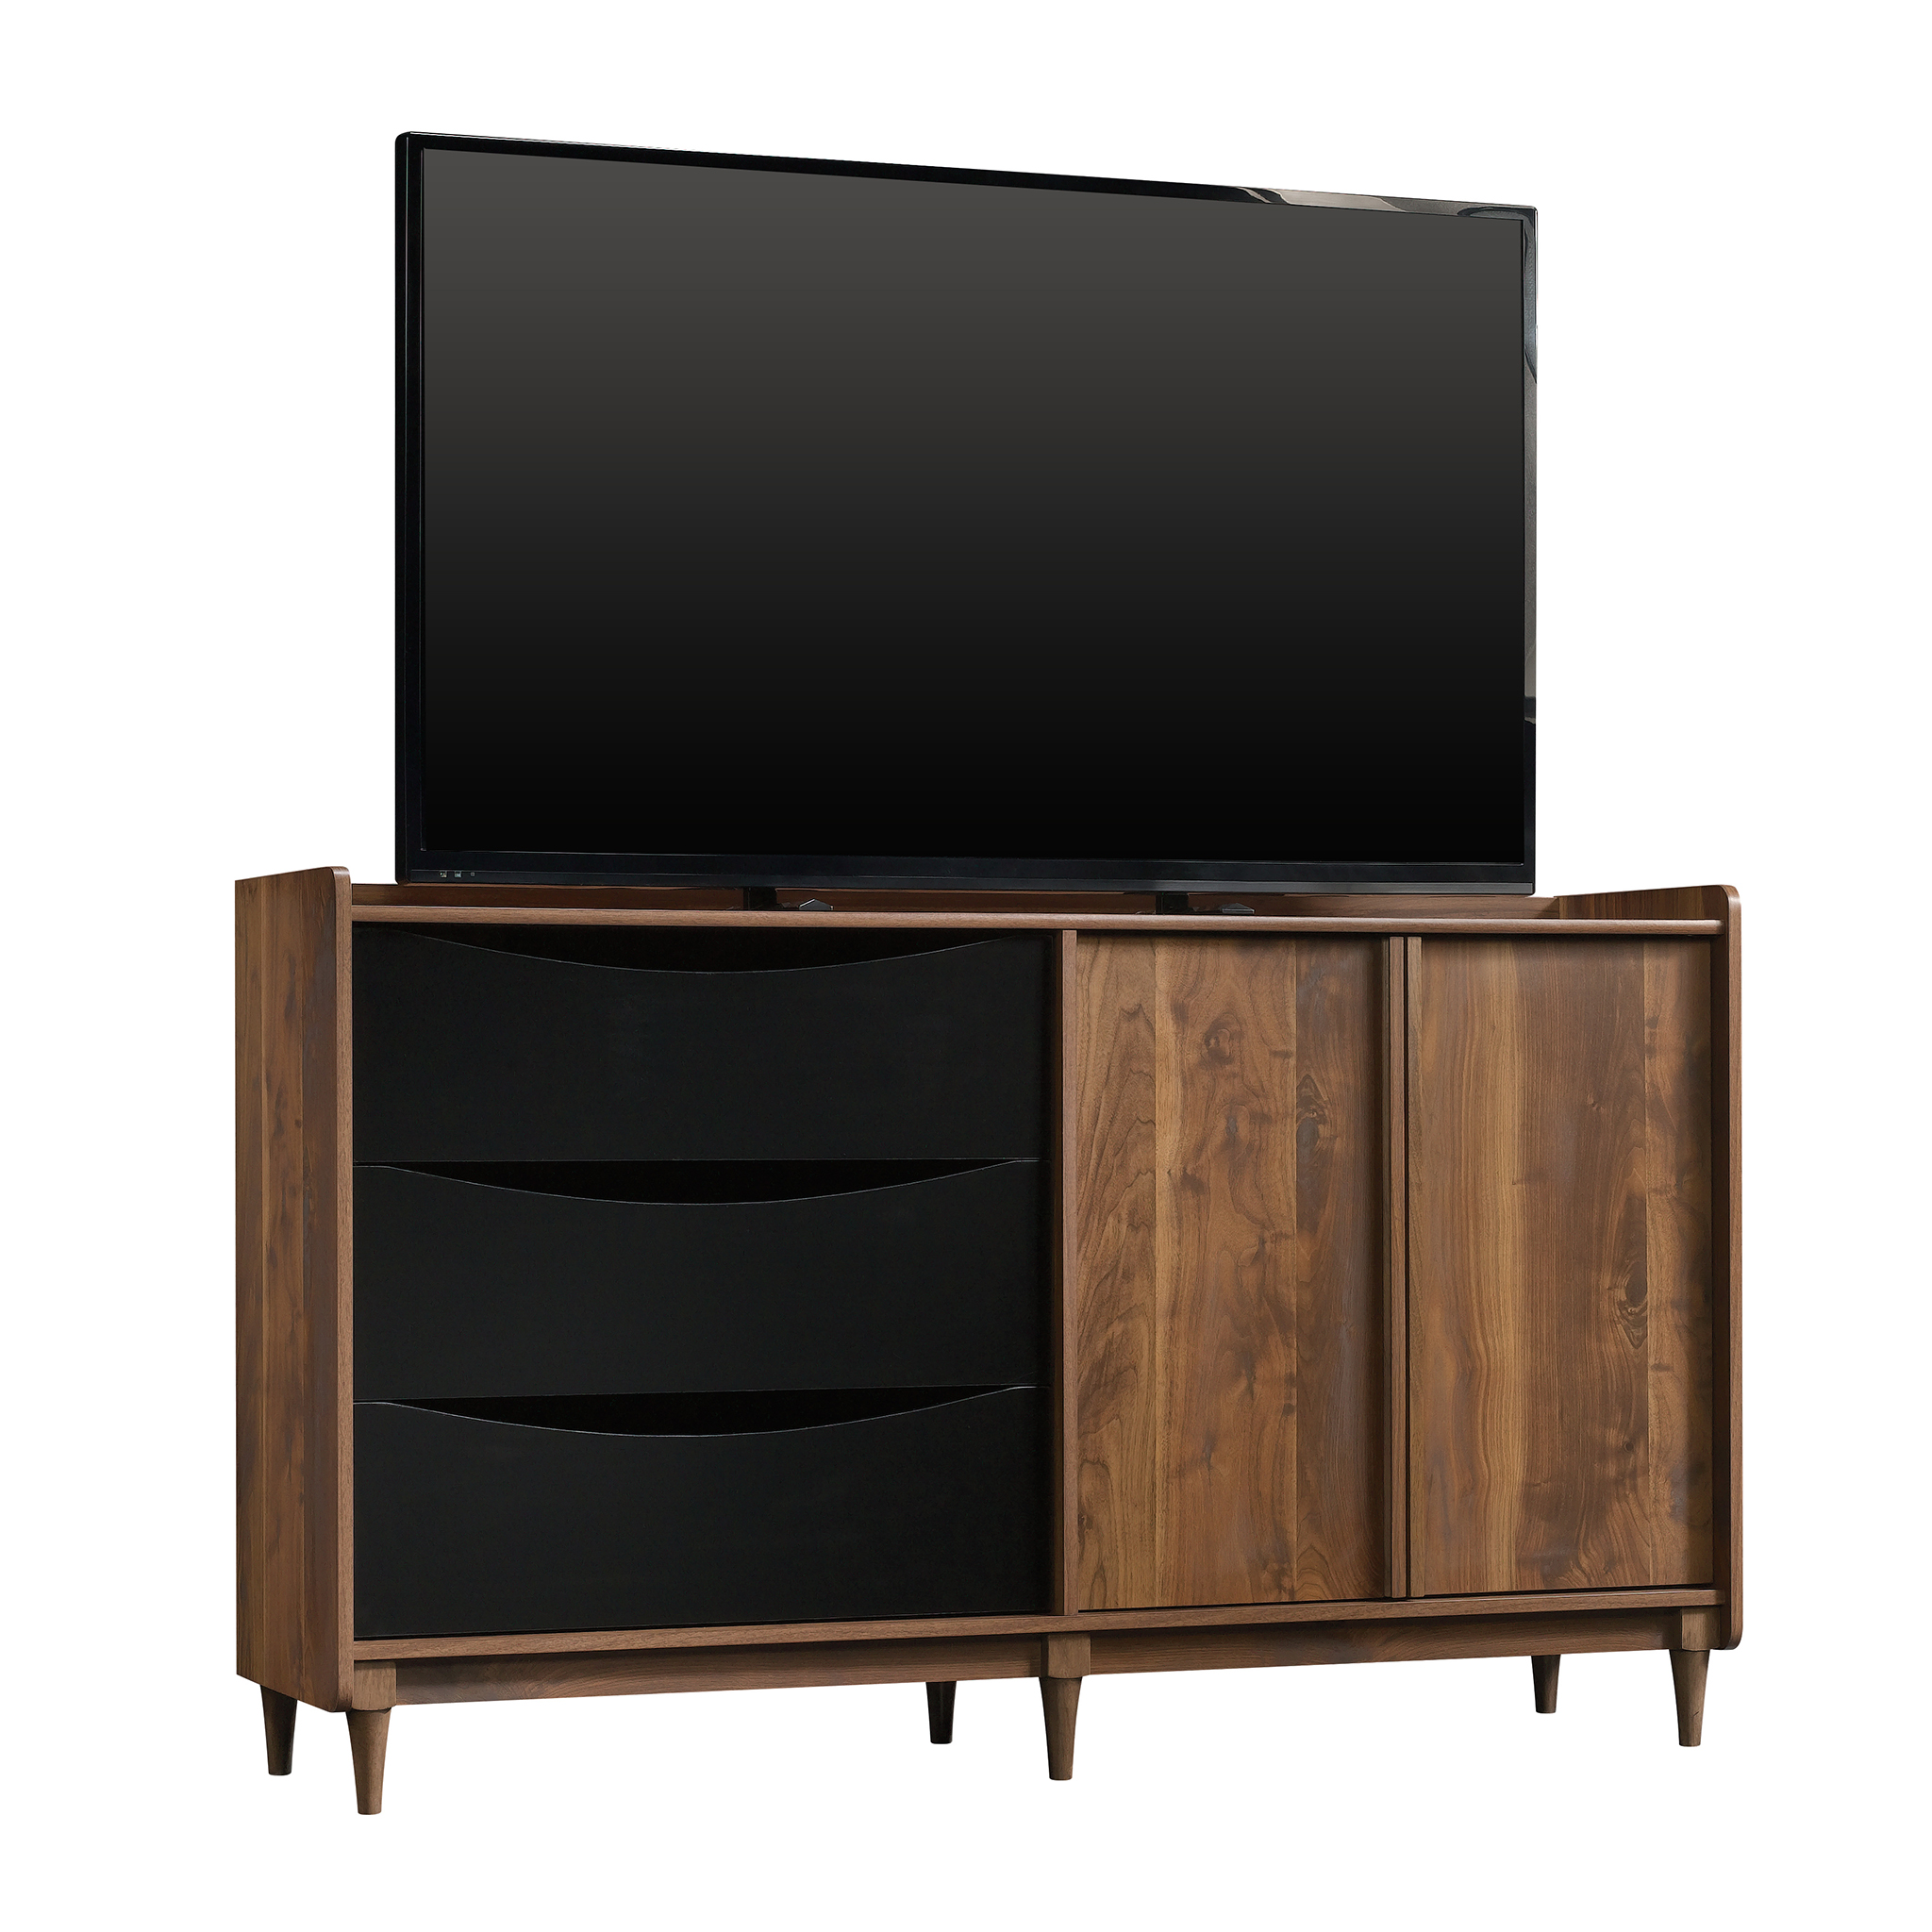 "Better Homes & Gardens Montclair Credenza for TVs up to 55"", Vintage Walnut Finish"